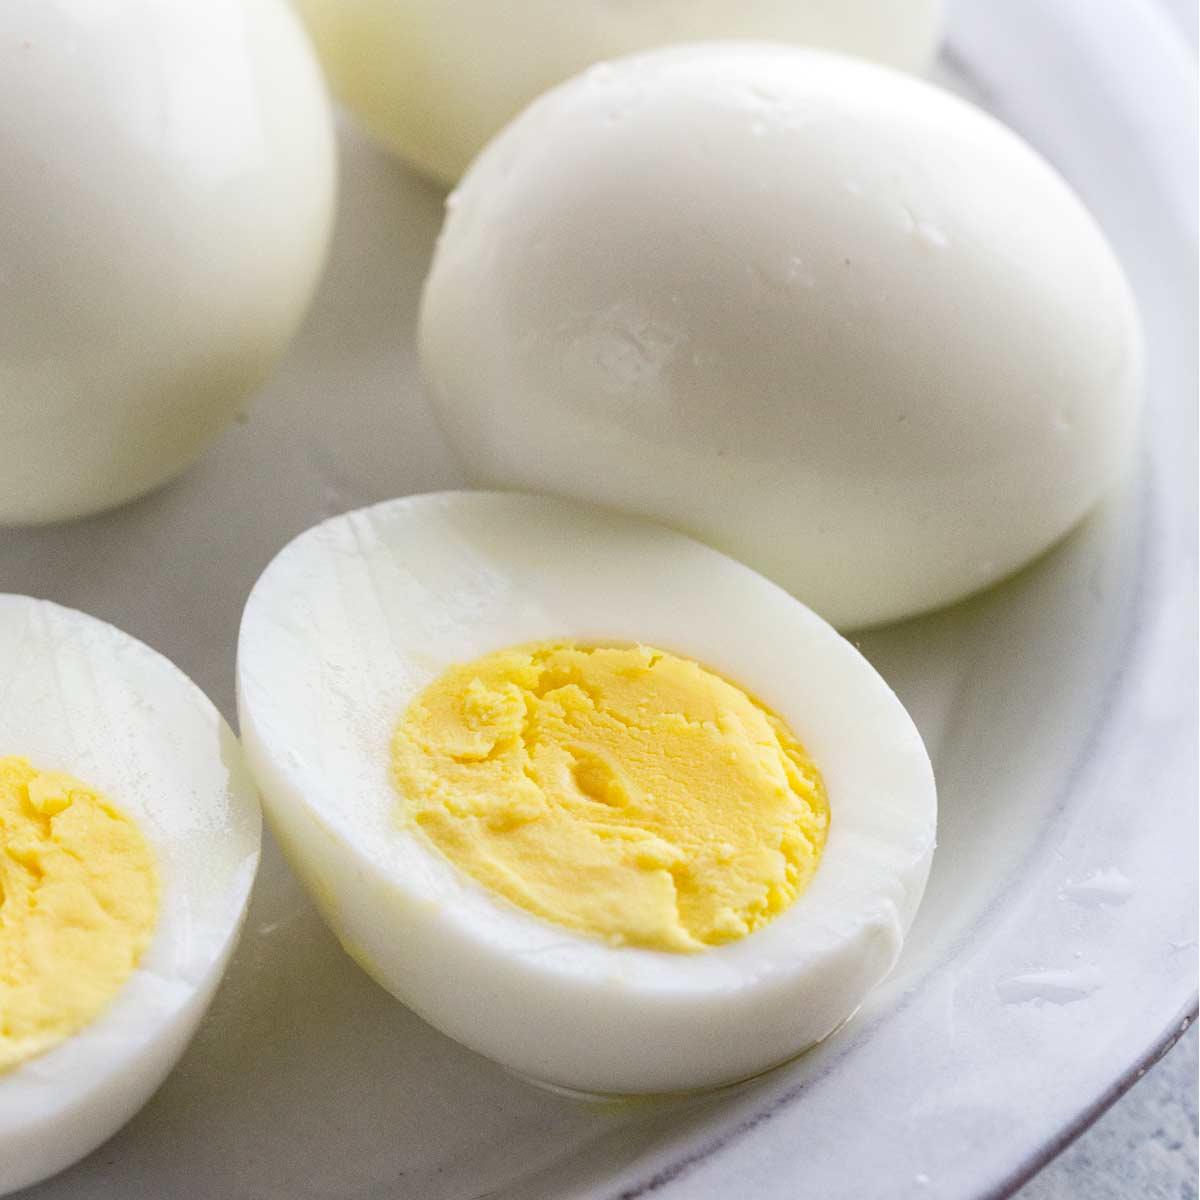 How to Make Hard Boiled Eggs (2 Ways!) - Jessica Gavin